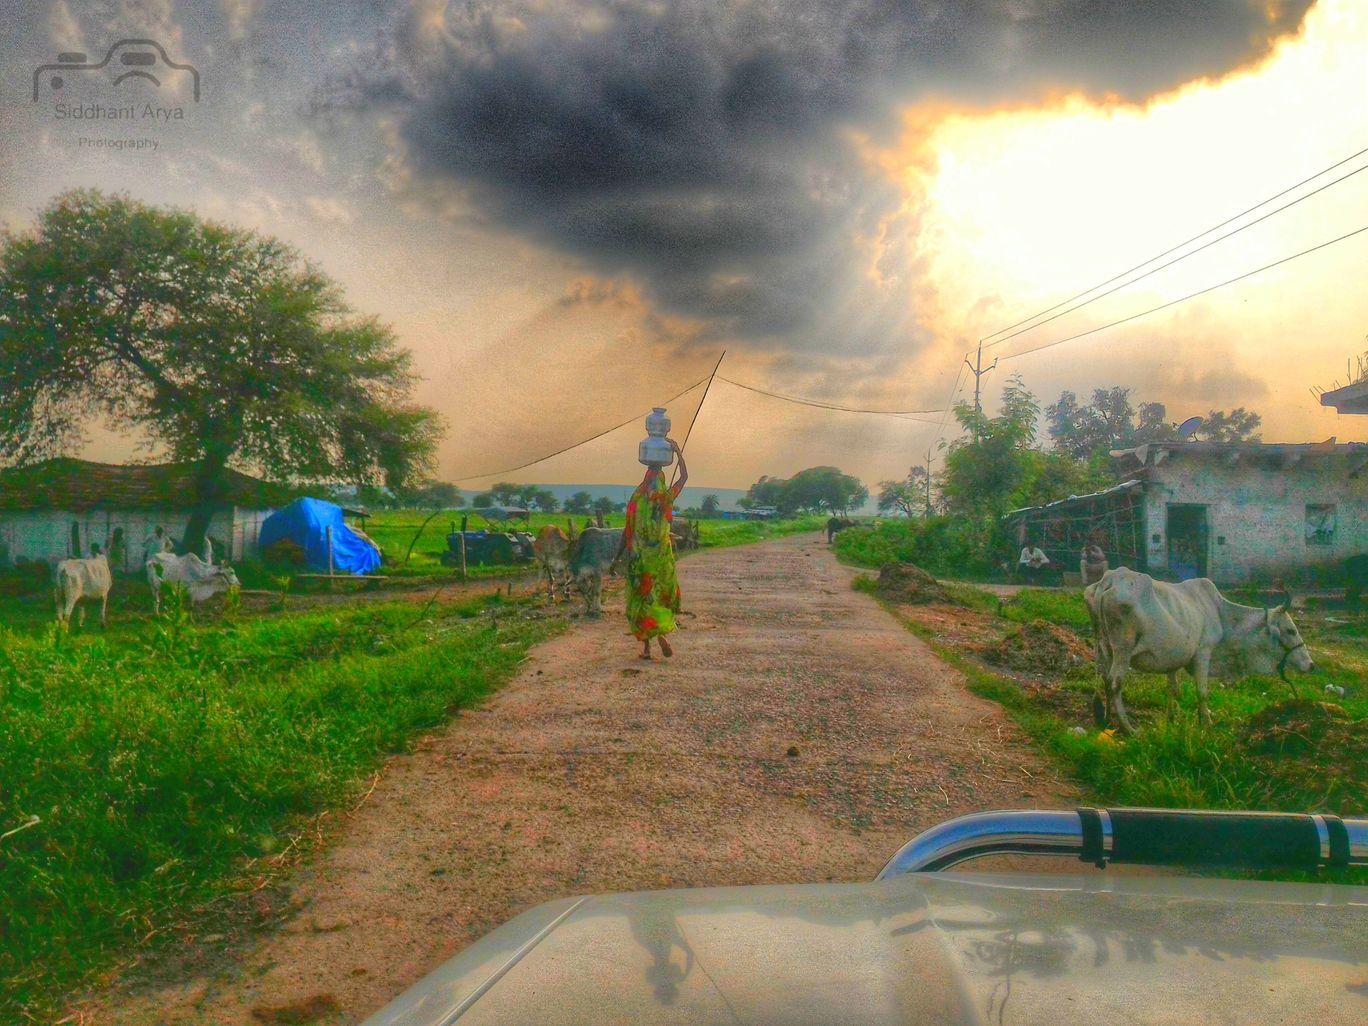 Photo of Bhopal By Siddhant Arya